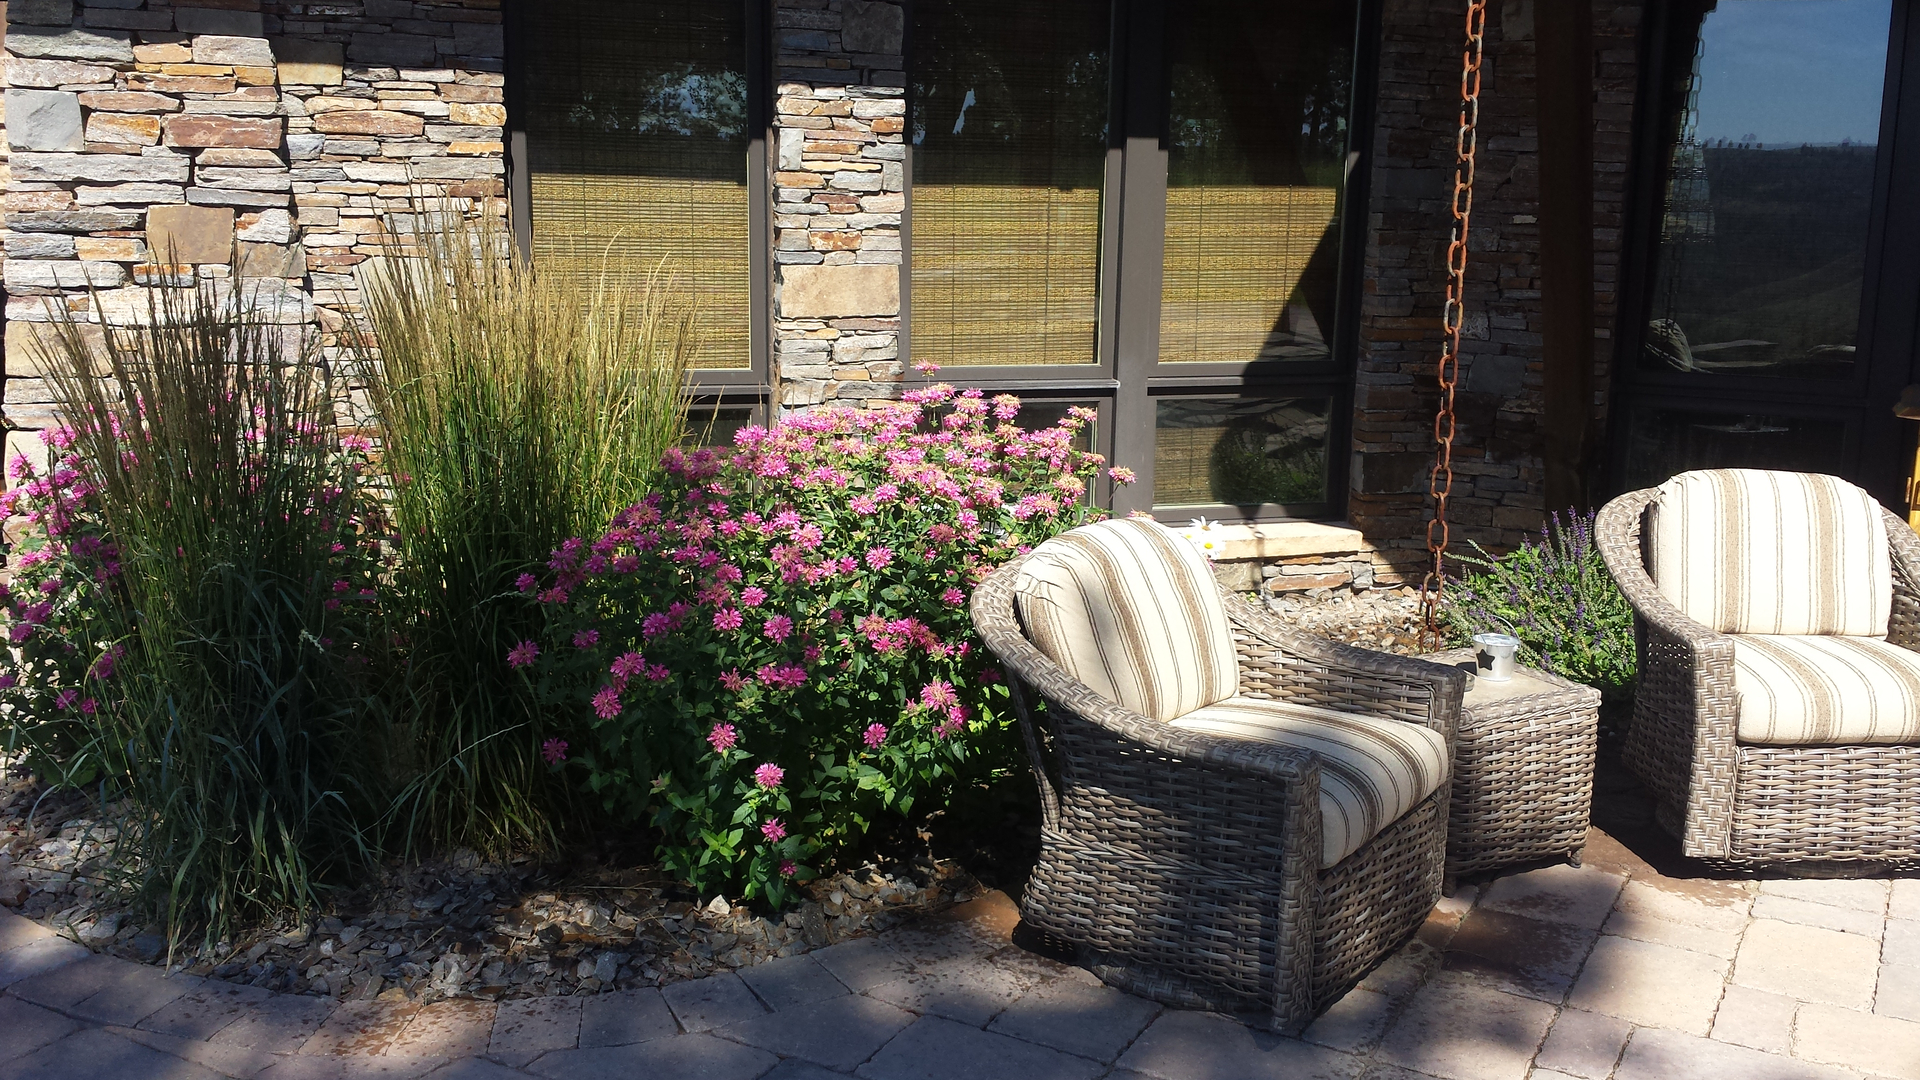 Landscape Garden Center Aspen ridge lawn landscape garden center landscaping services workwithnaturefo